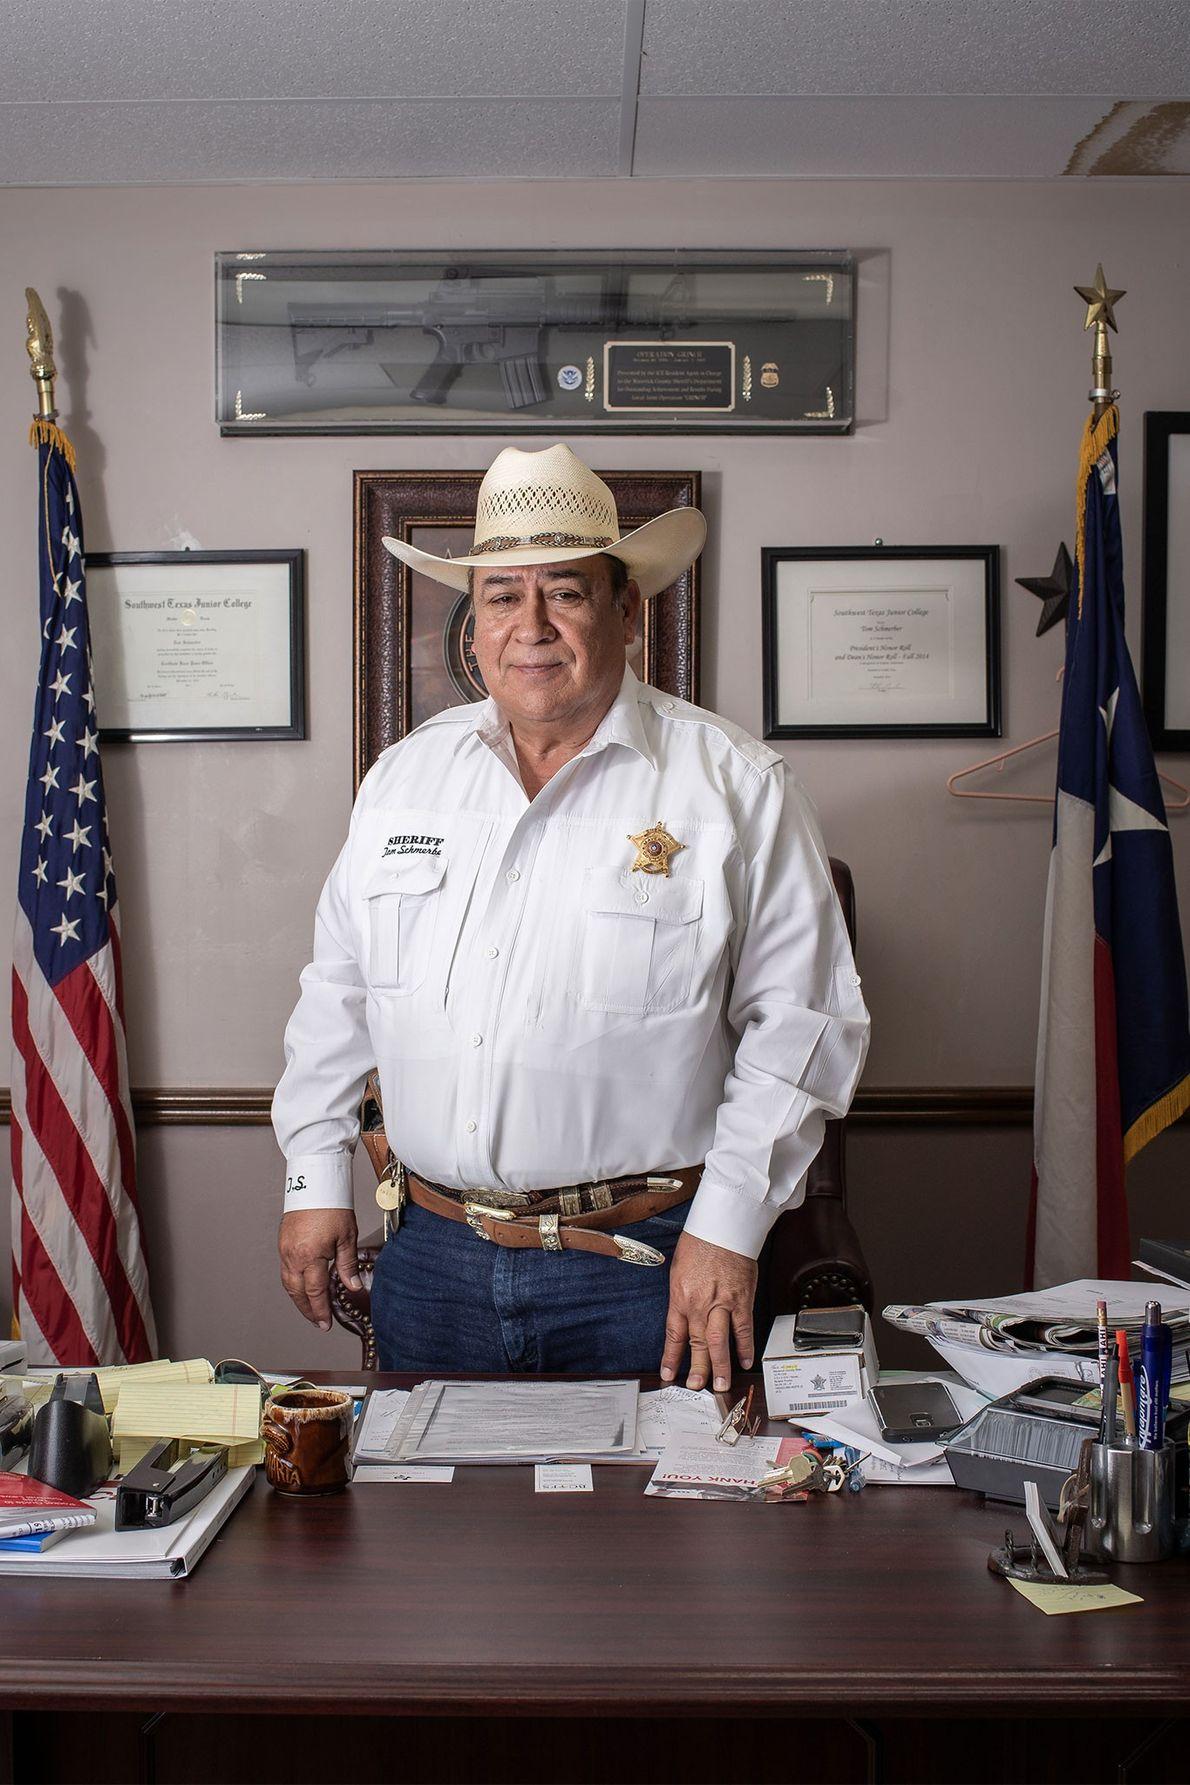 El sheriff Tom Schmerber